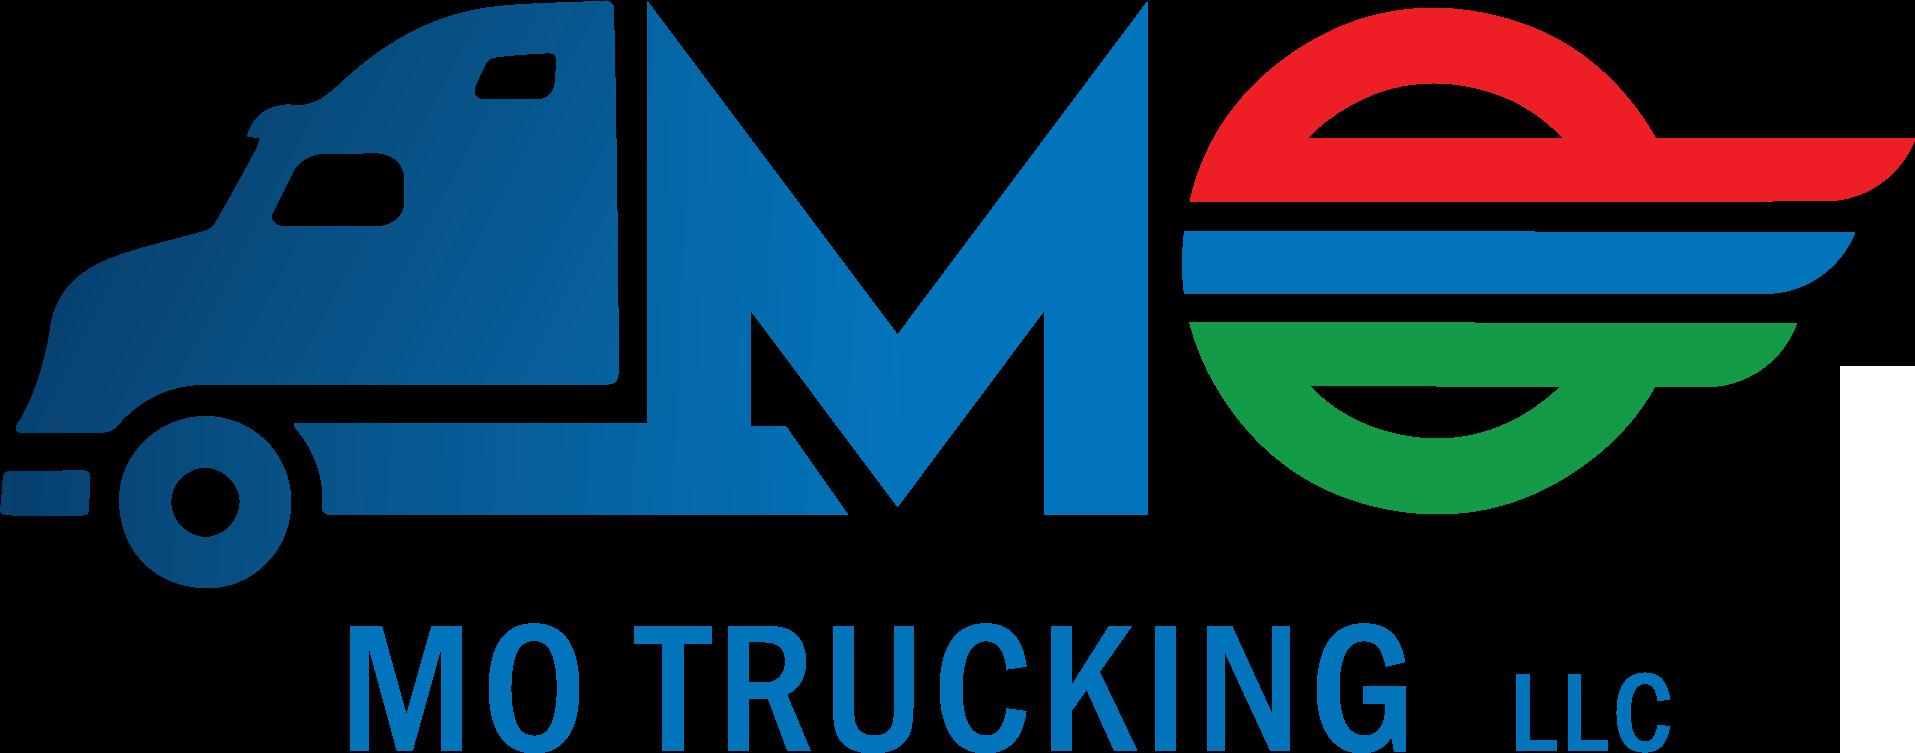 MO Trucking LLC logo